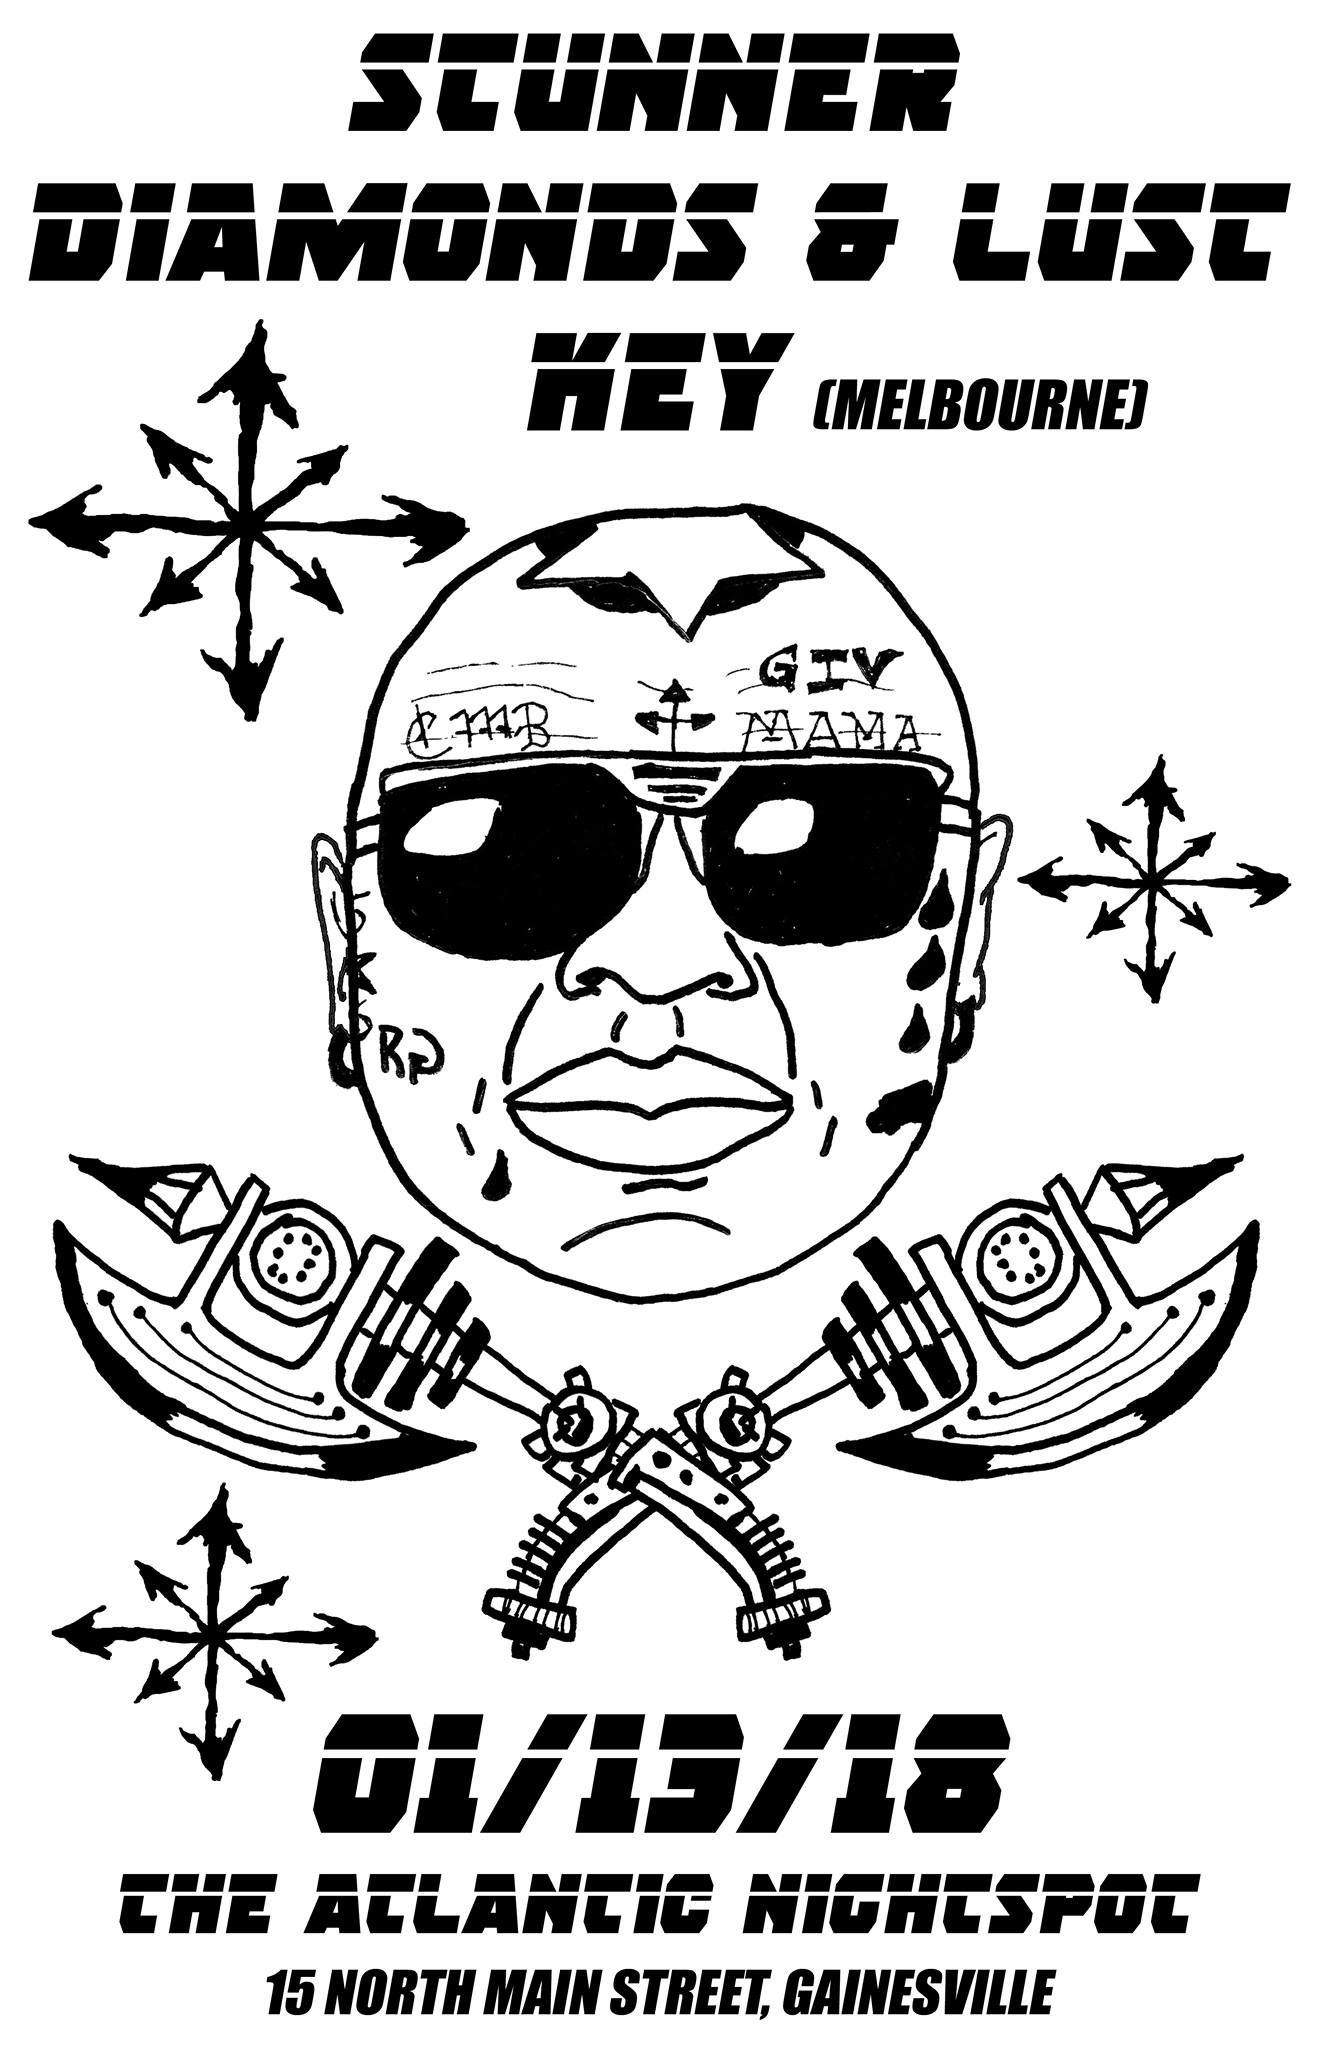 A Night of hard rock and metal with  Stunner - New Wave of Florida Heavy Metal  https://stunnernwothm.bandcamp.com/   Diamonds & Lust - Sleazy Hard Rock  diamondsandlust.bandcamp.com   Key - Tradition progressive metal from Melbourne, Florida  https://keytheband.bandcamp.com/